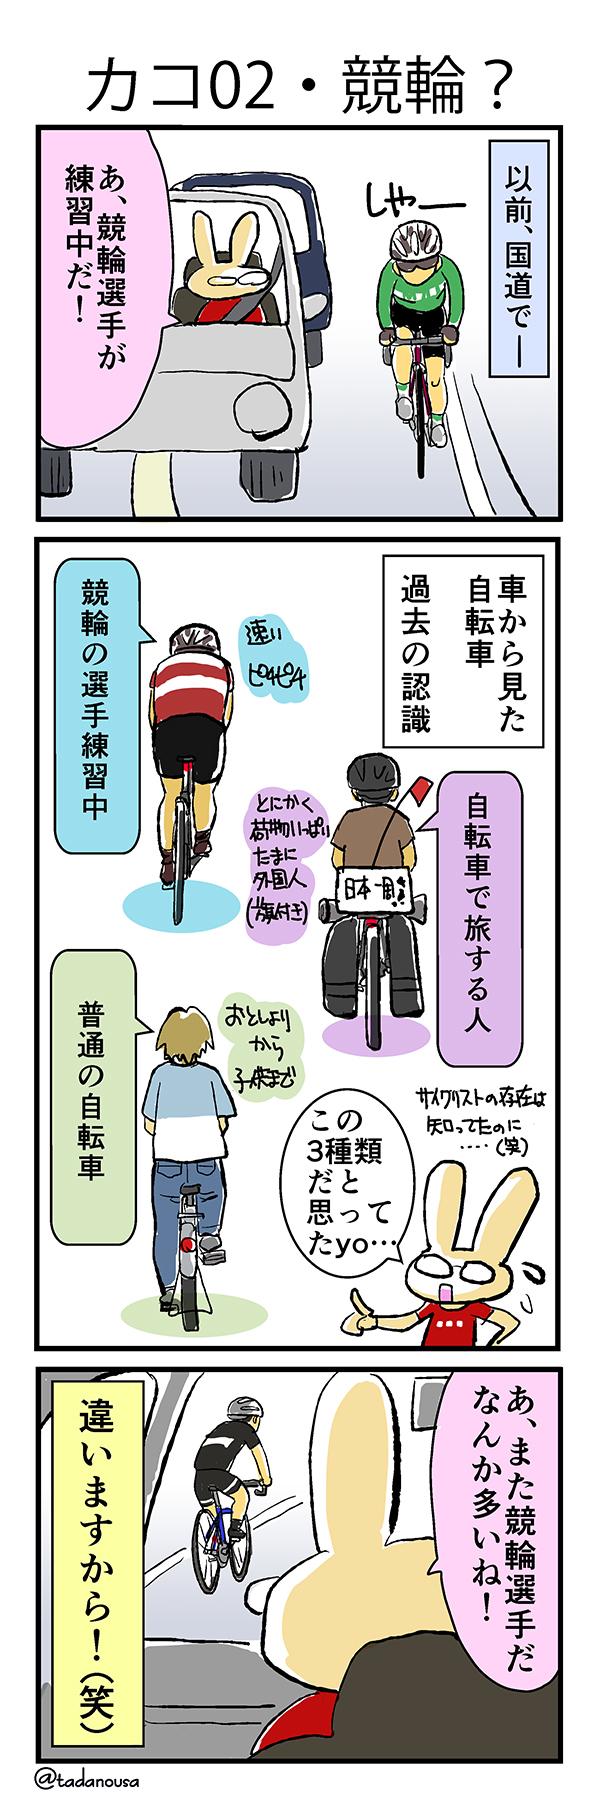 bike_4koma_kako002_s.jpg